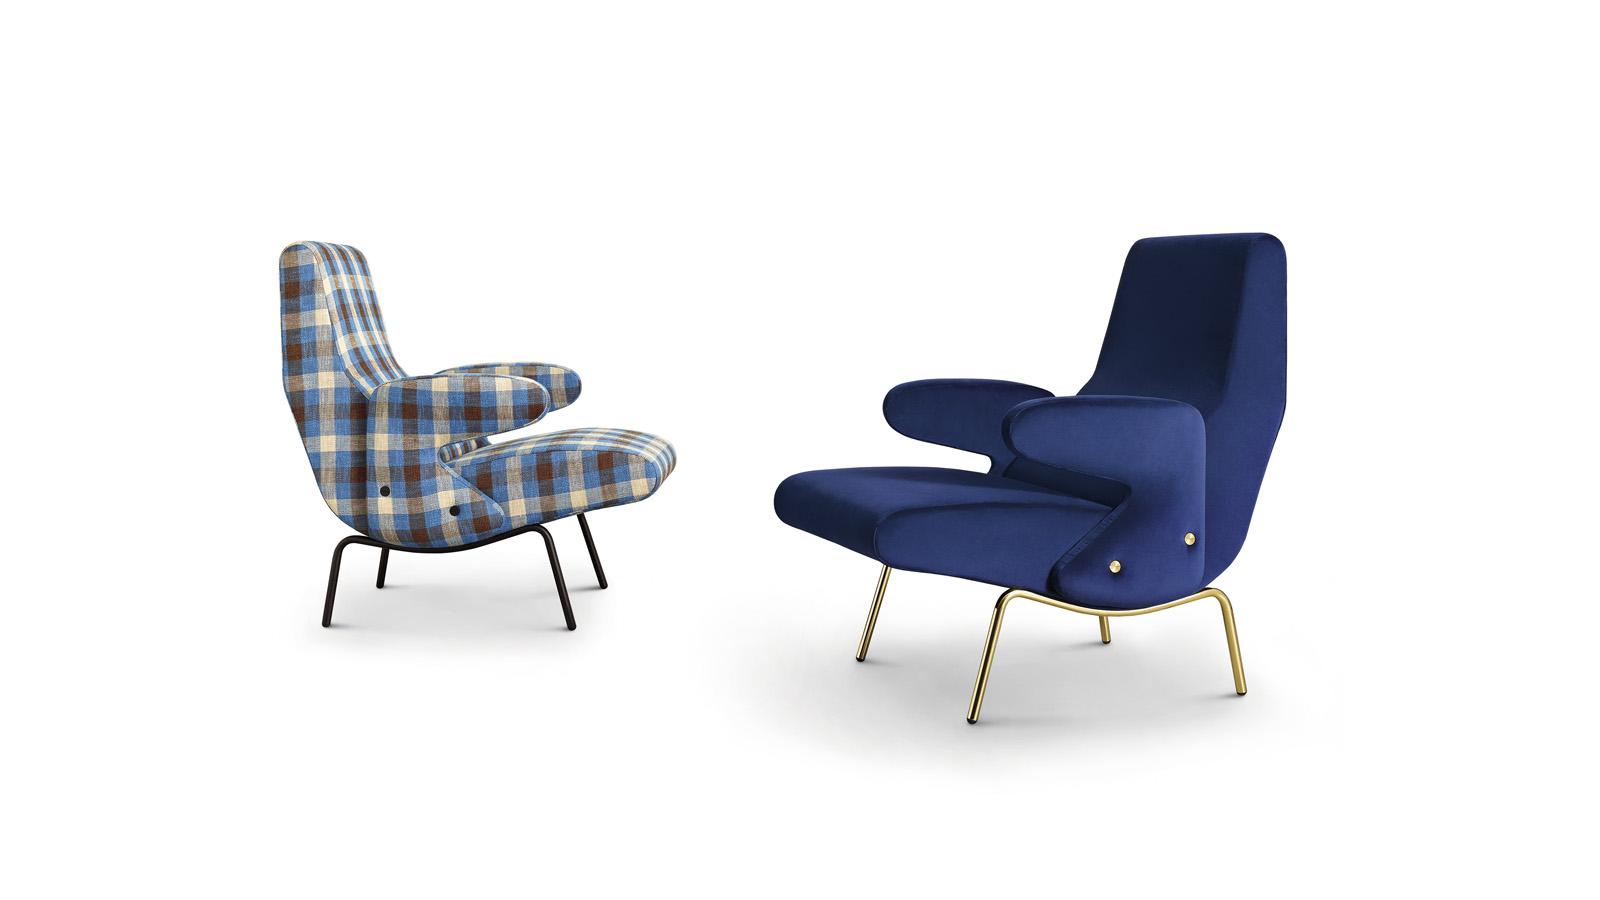 TinnappleMetz-arflex-delfino-armchair_02